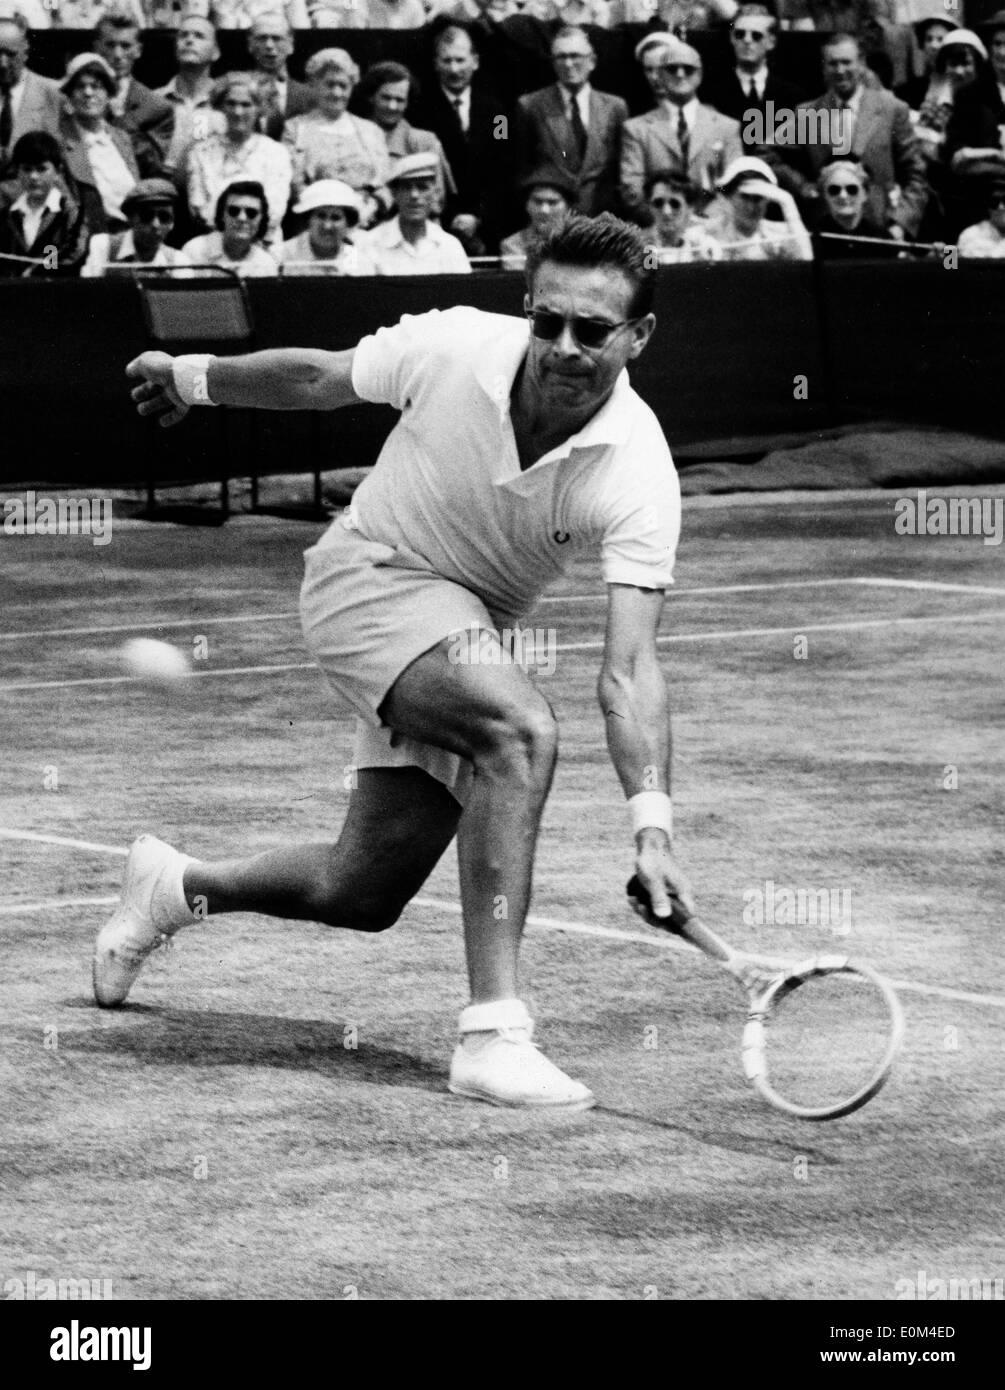 Tennis Champion Jaroslav Drobny in a match against B Bartzen at